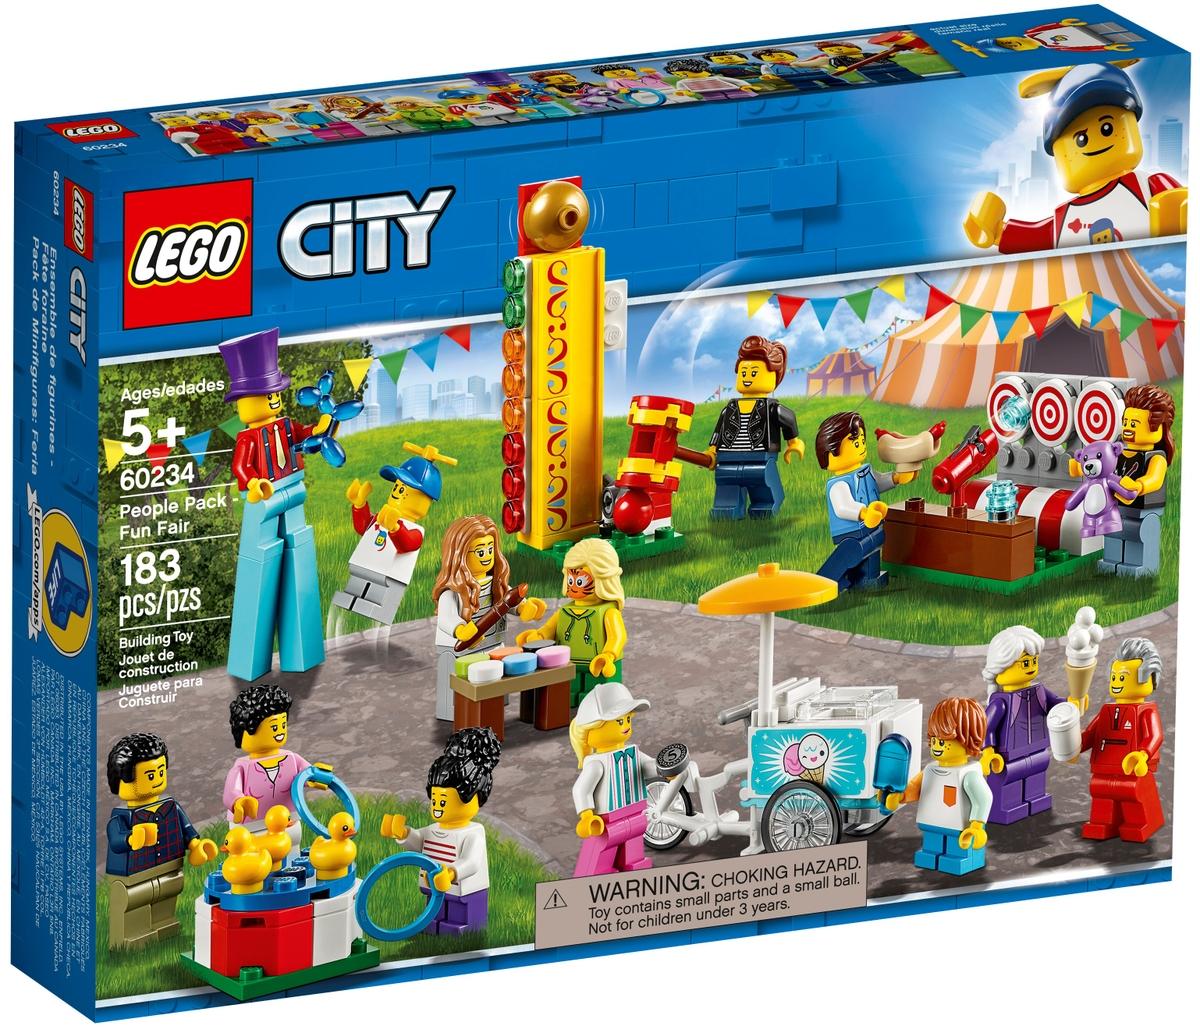 lego 60234 people pack fun fair